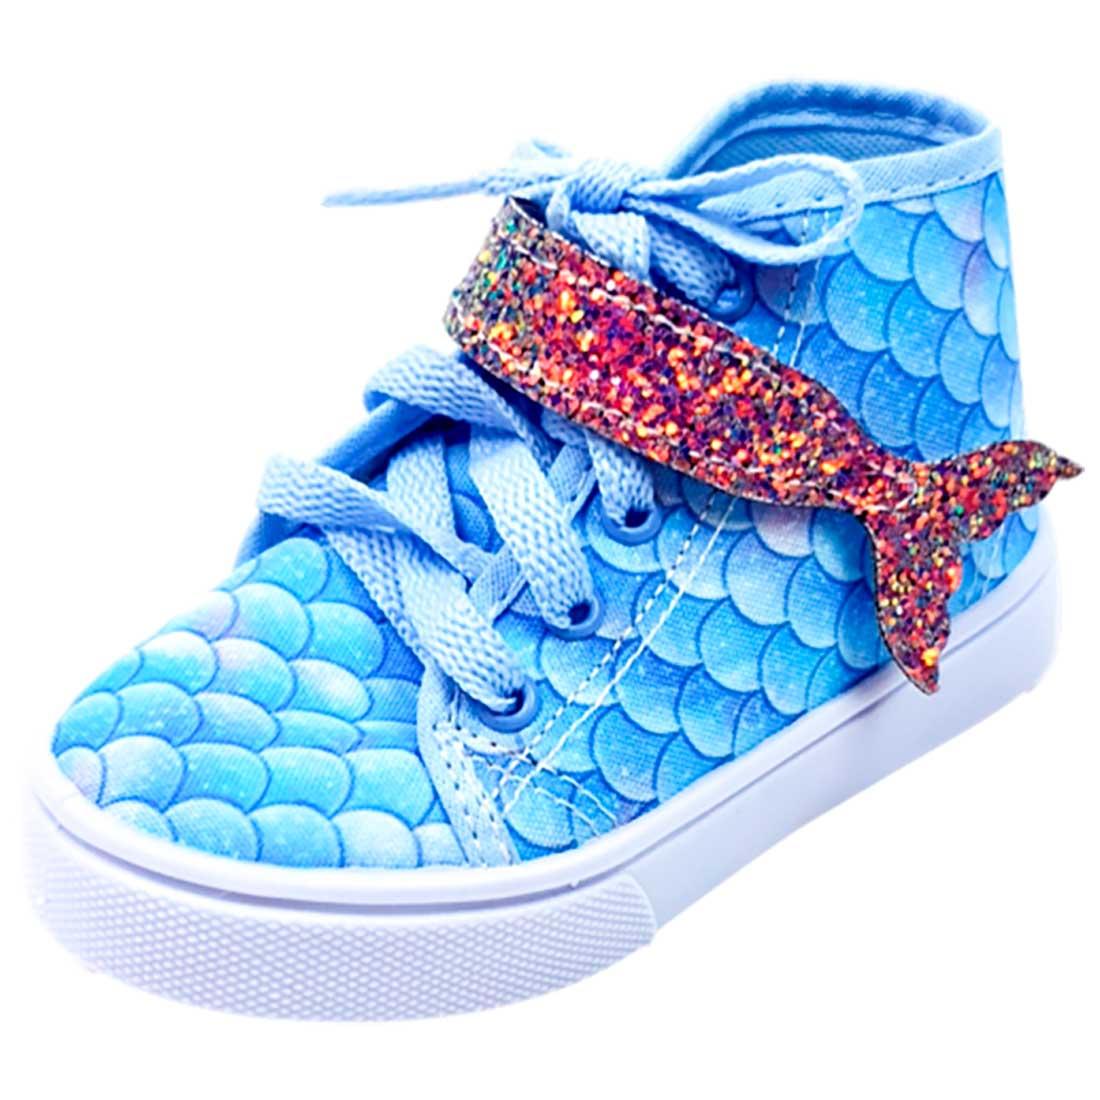 Tênis Baby Cano Alto Sereia - Azul